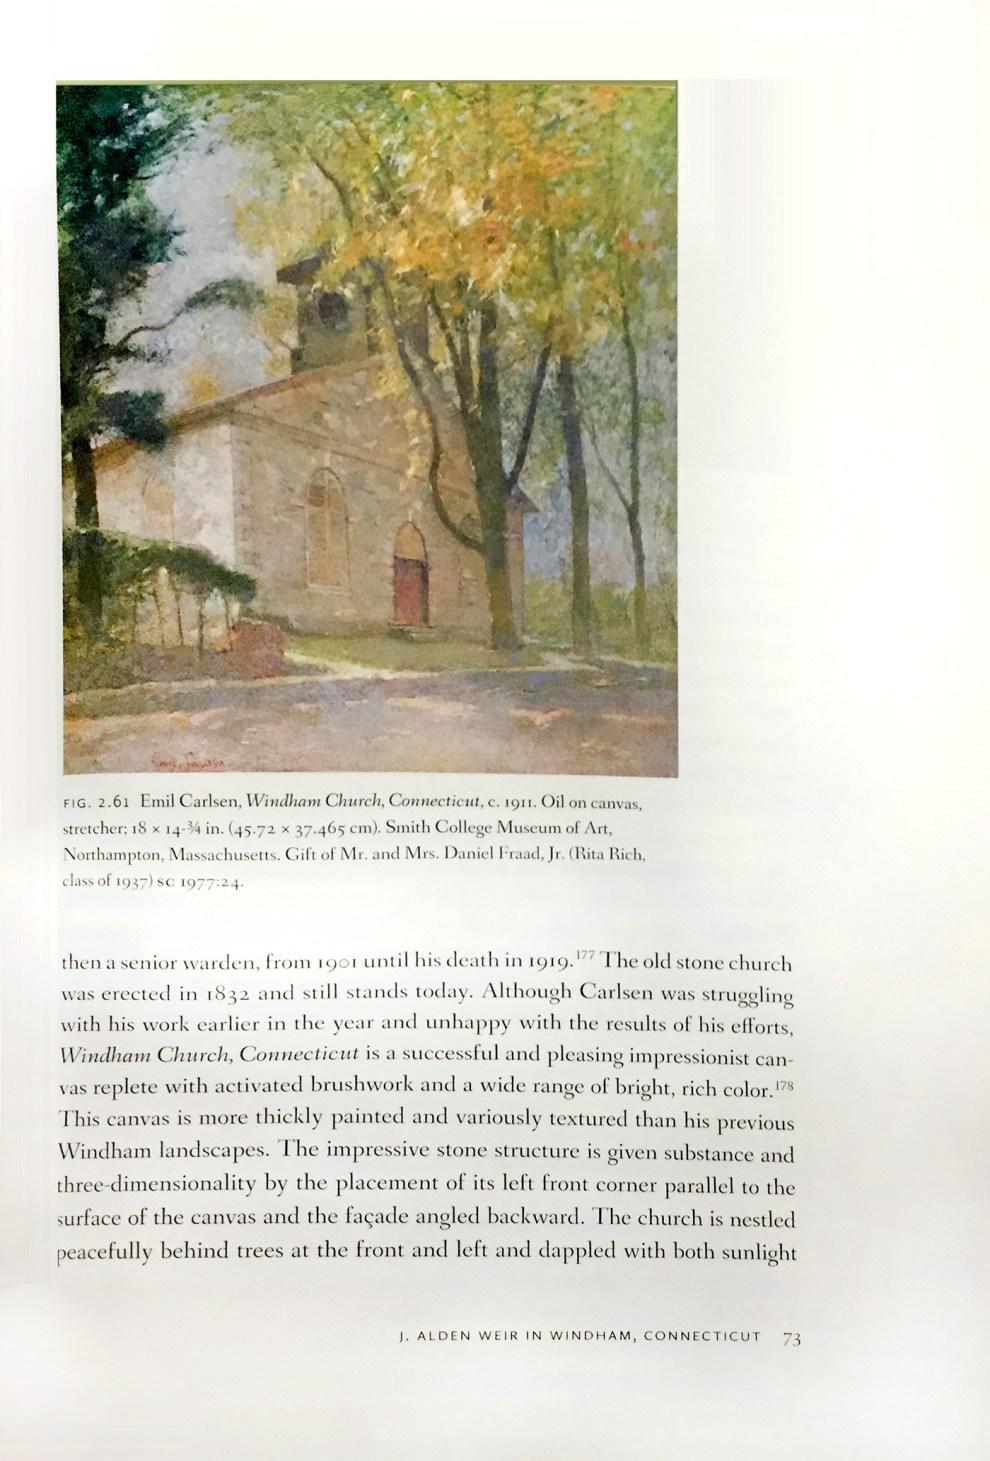 """Rare Light: J. Alden Weir in Windham, Connecticut, 1882-1919"" edited by Anne E. Dawson, Wesleyan, Middletown, CT, 2016"